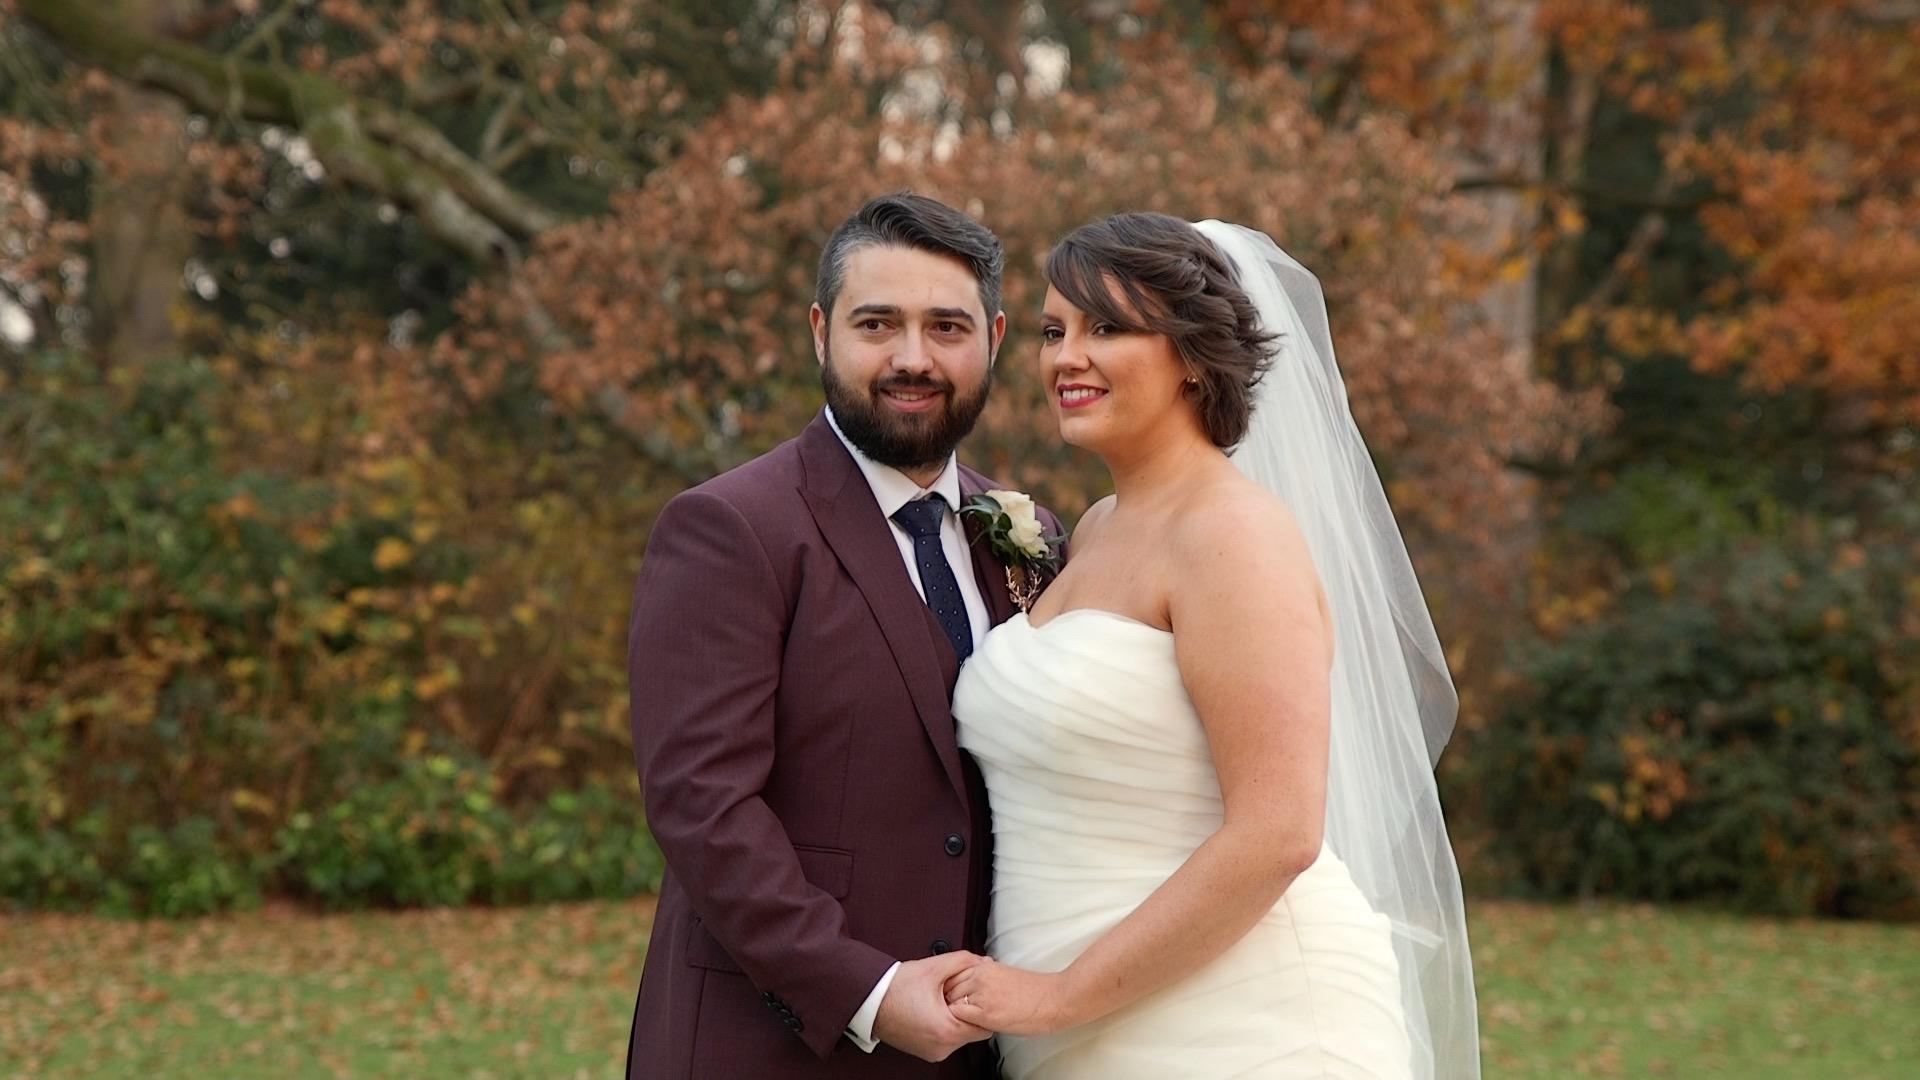 Somerford Hall wedding